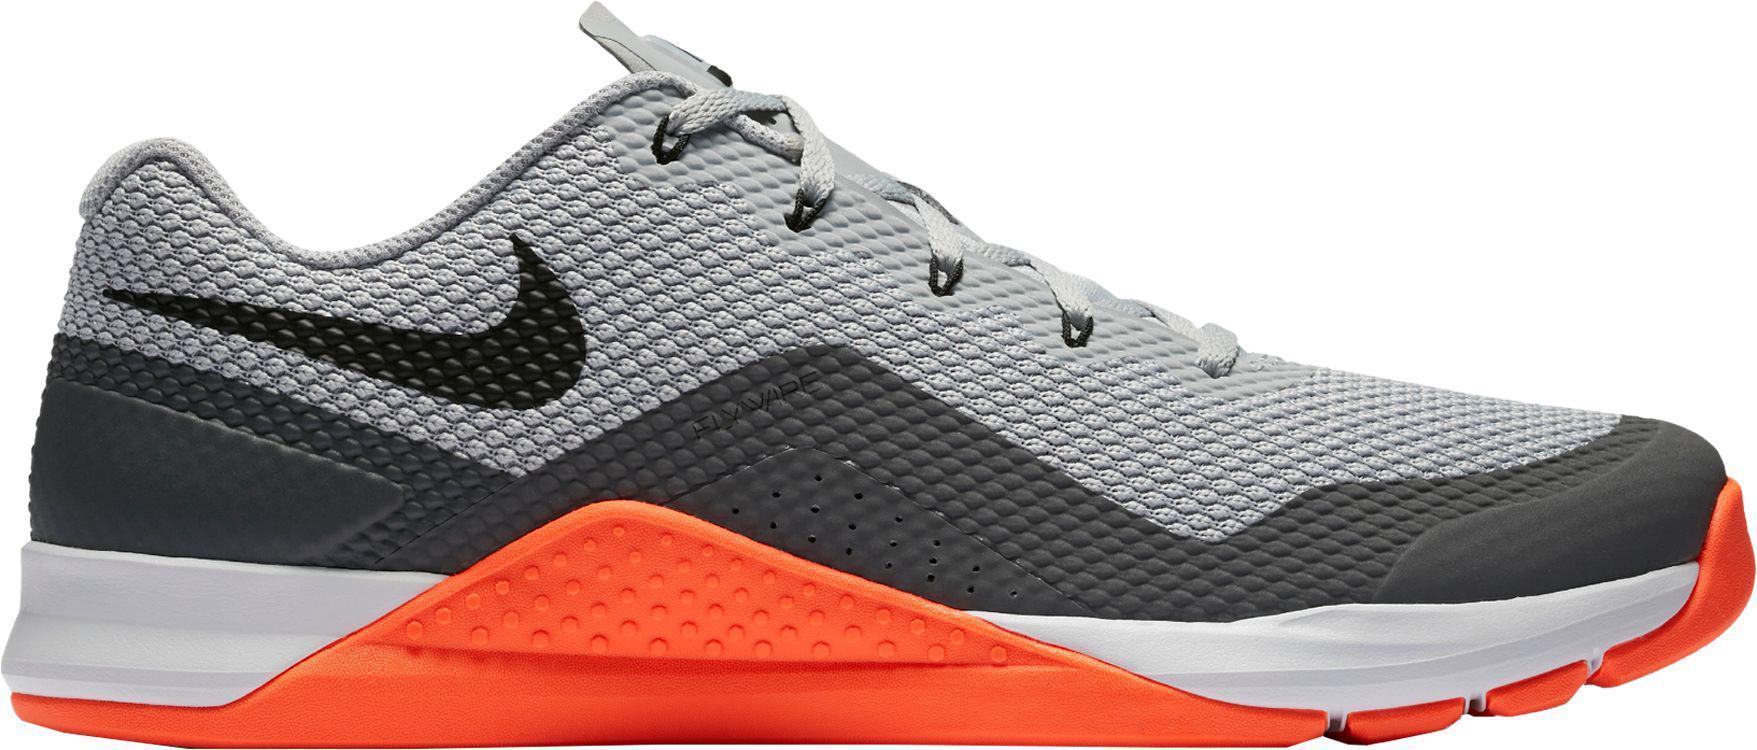 f6ada1eb51e Lyst - Nike Metcon Repper Dsx Training Shoes in Gray for Men